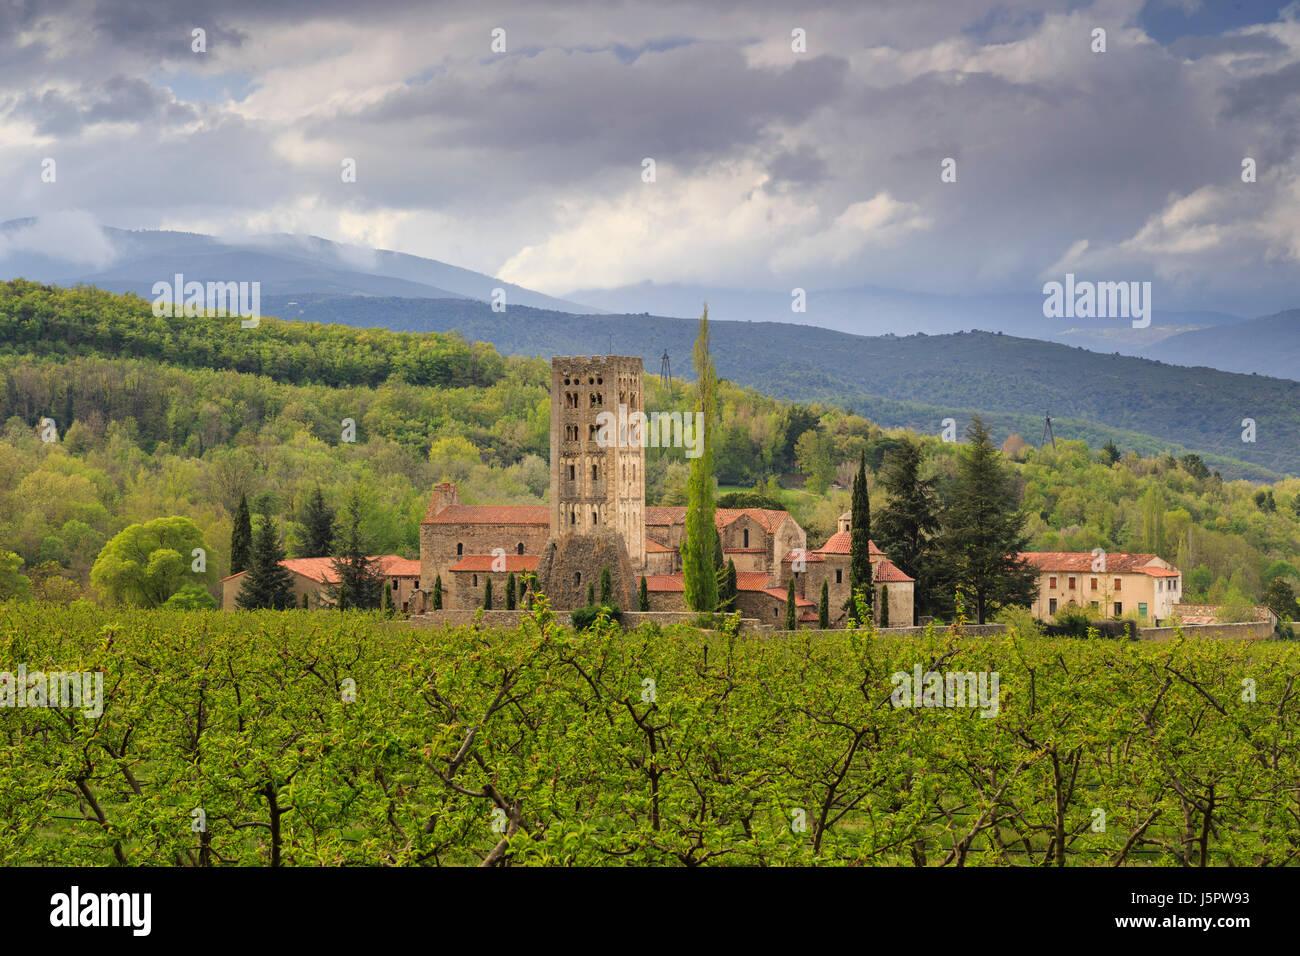 Francia, Pirineos Orientales (66), Codalet, abbaye de Saint-Michel de Cuxa // Francia, Pirineos Orientales, Codalet, Foto de stock